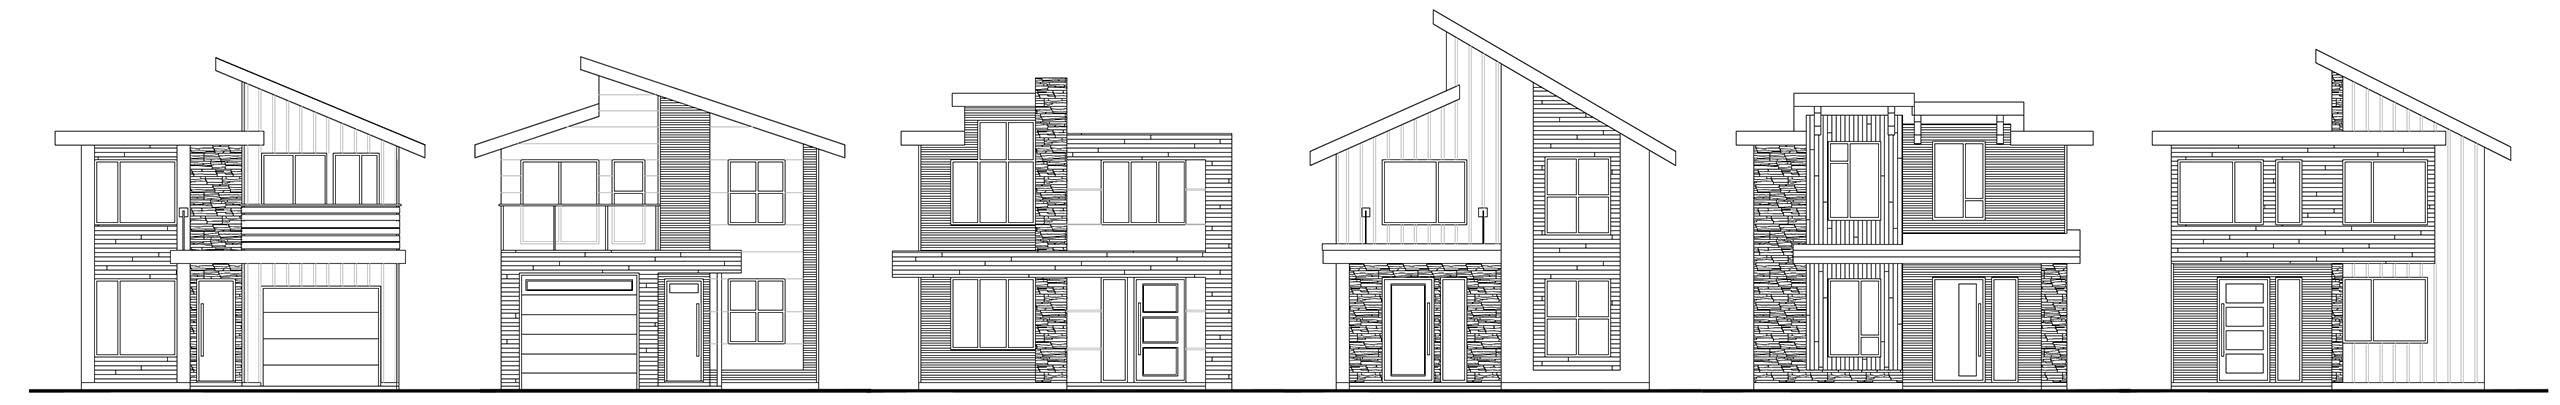 Trites & Moncton sketch